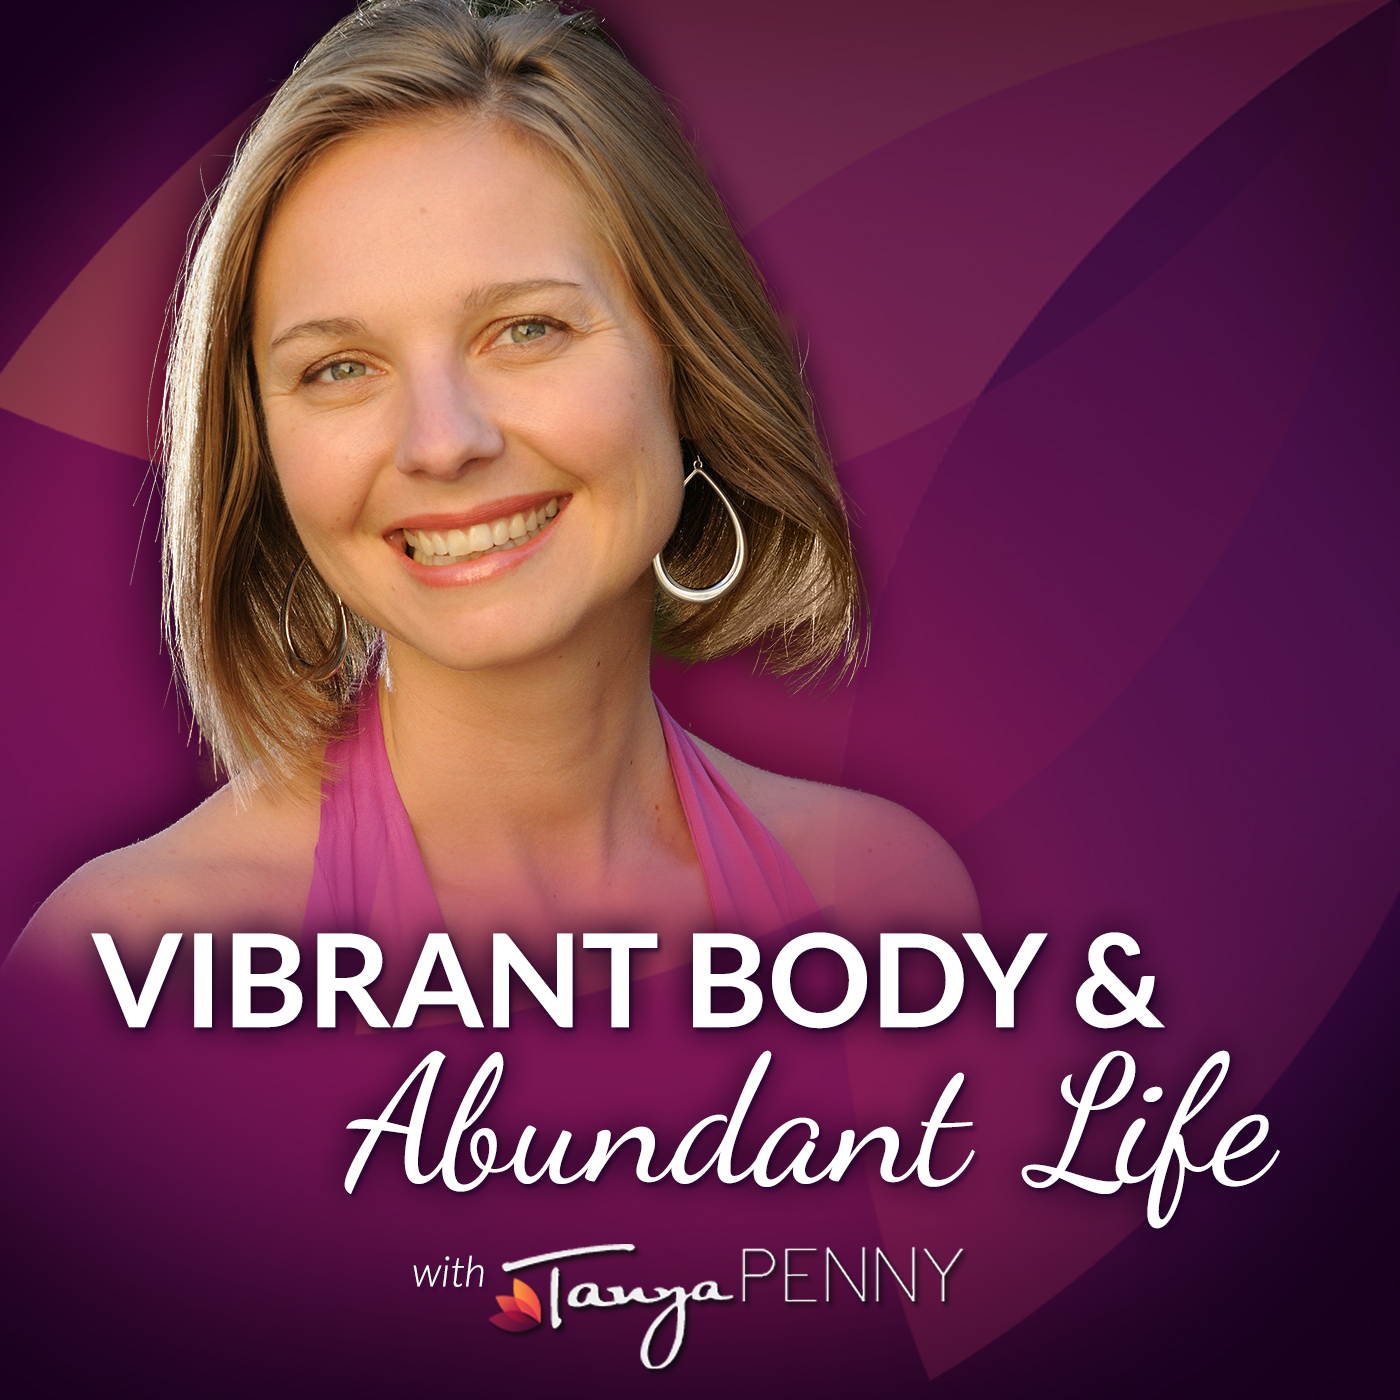 Vibrant Body & Abundant Life